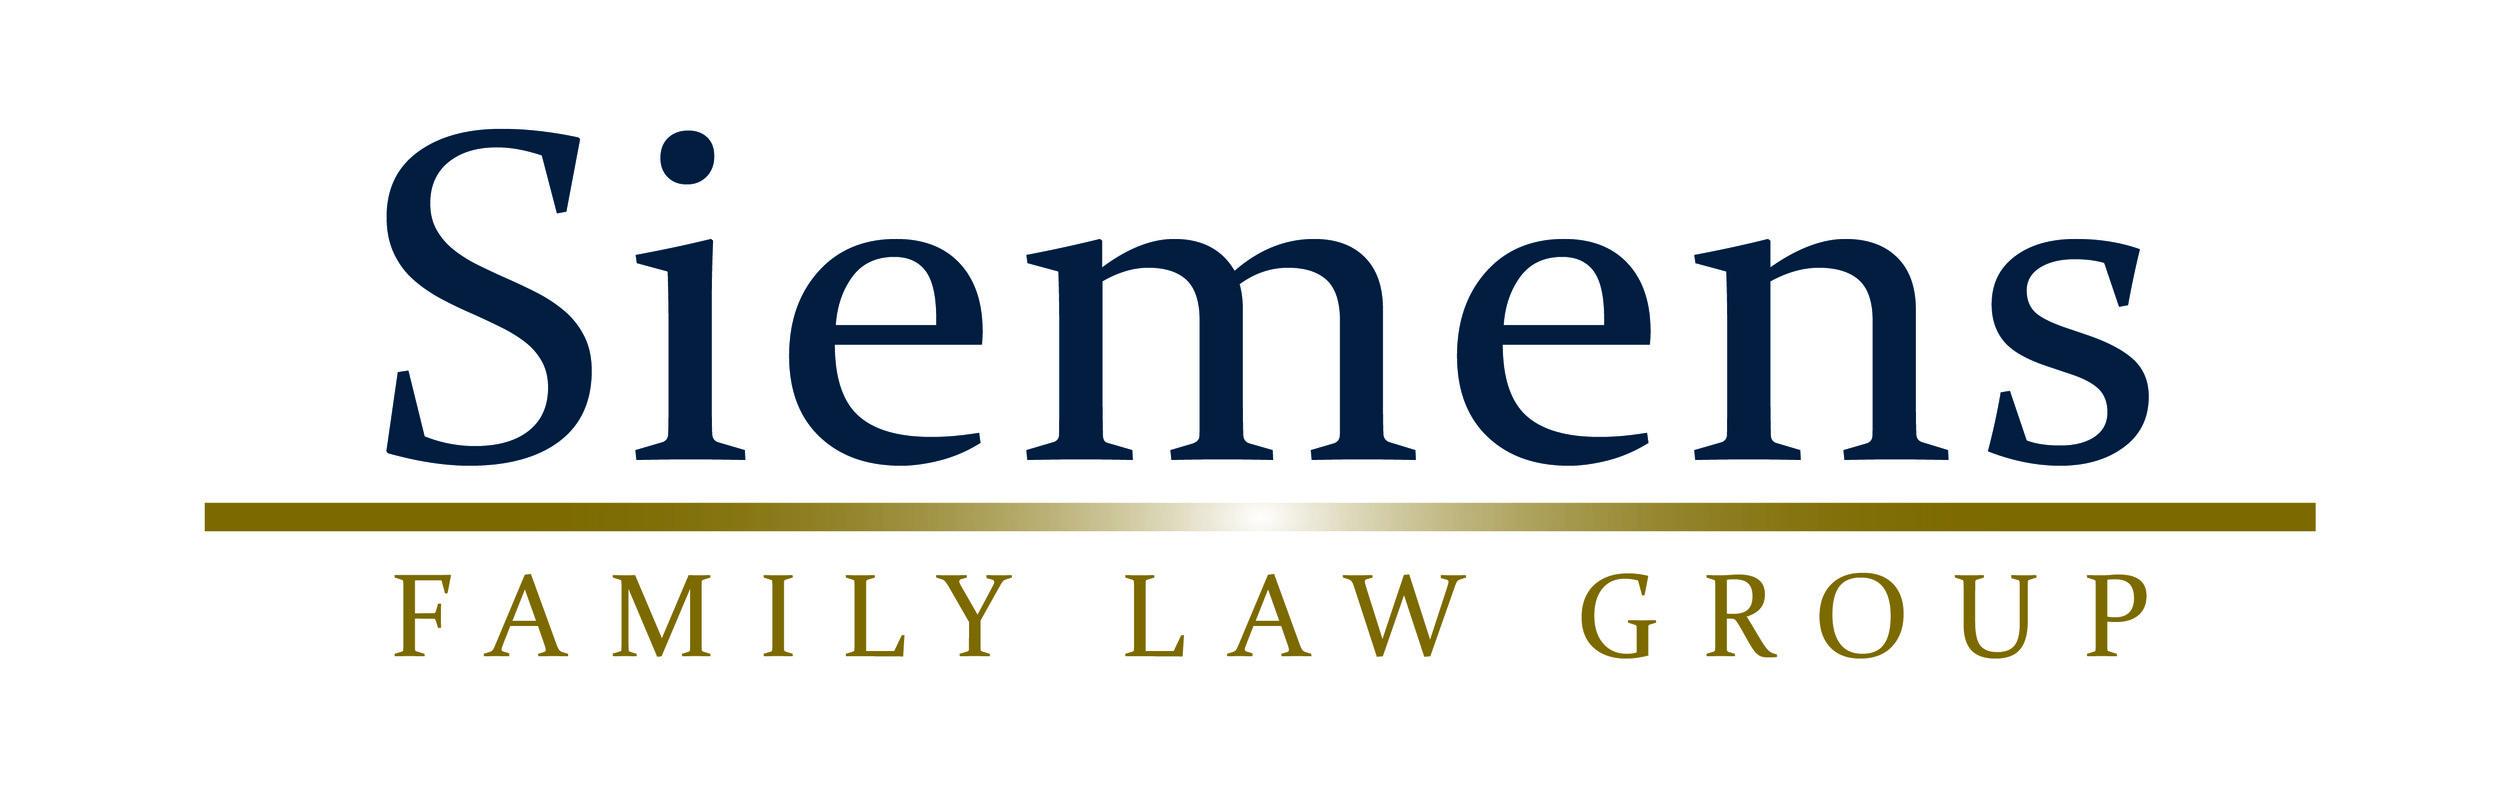 Siemens Family Law Group.jpg